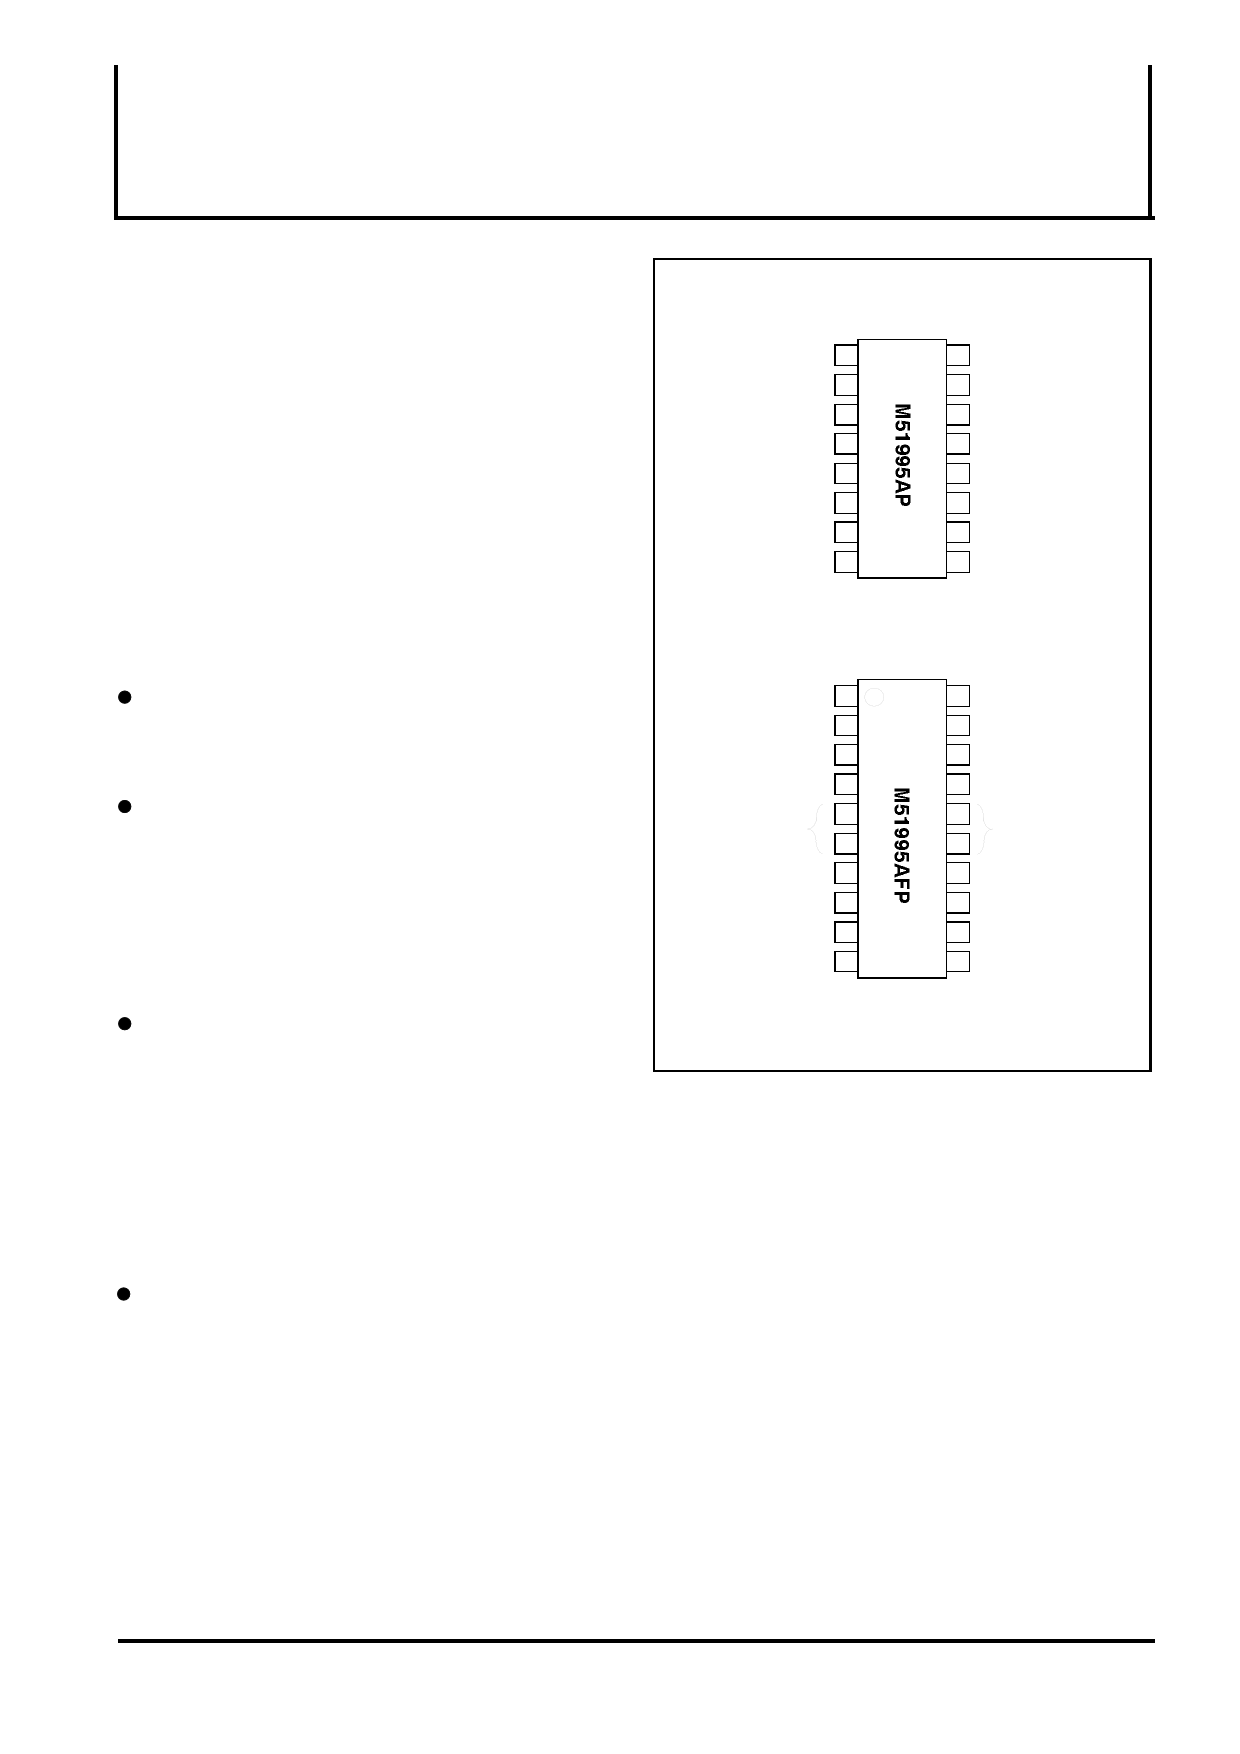 m51995  u30c7 u30fc u30bf u30b7 u30fc u30c8 pdf